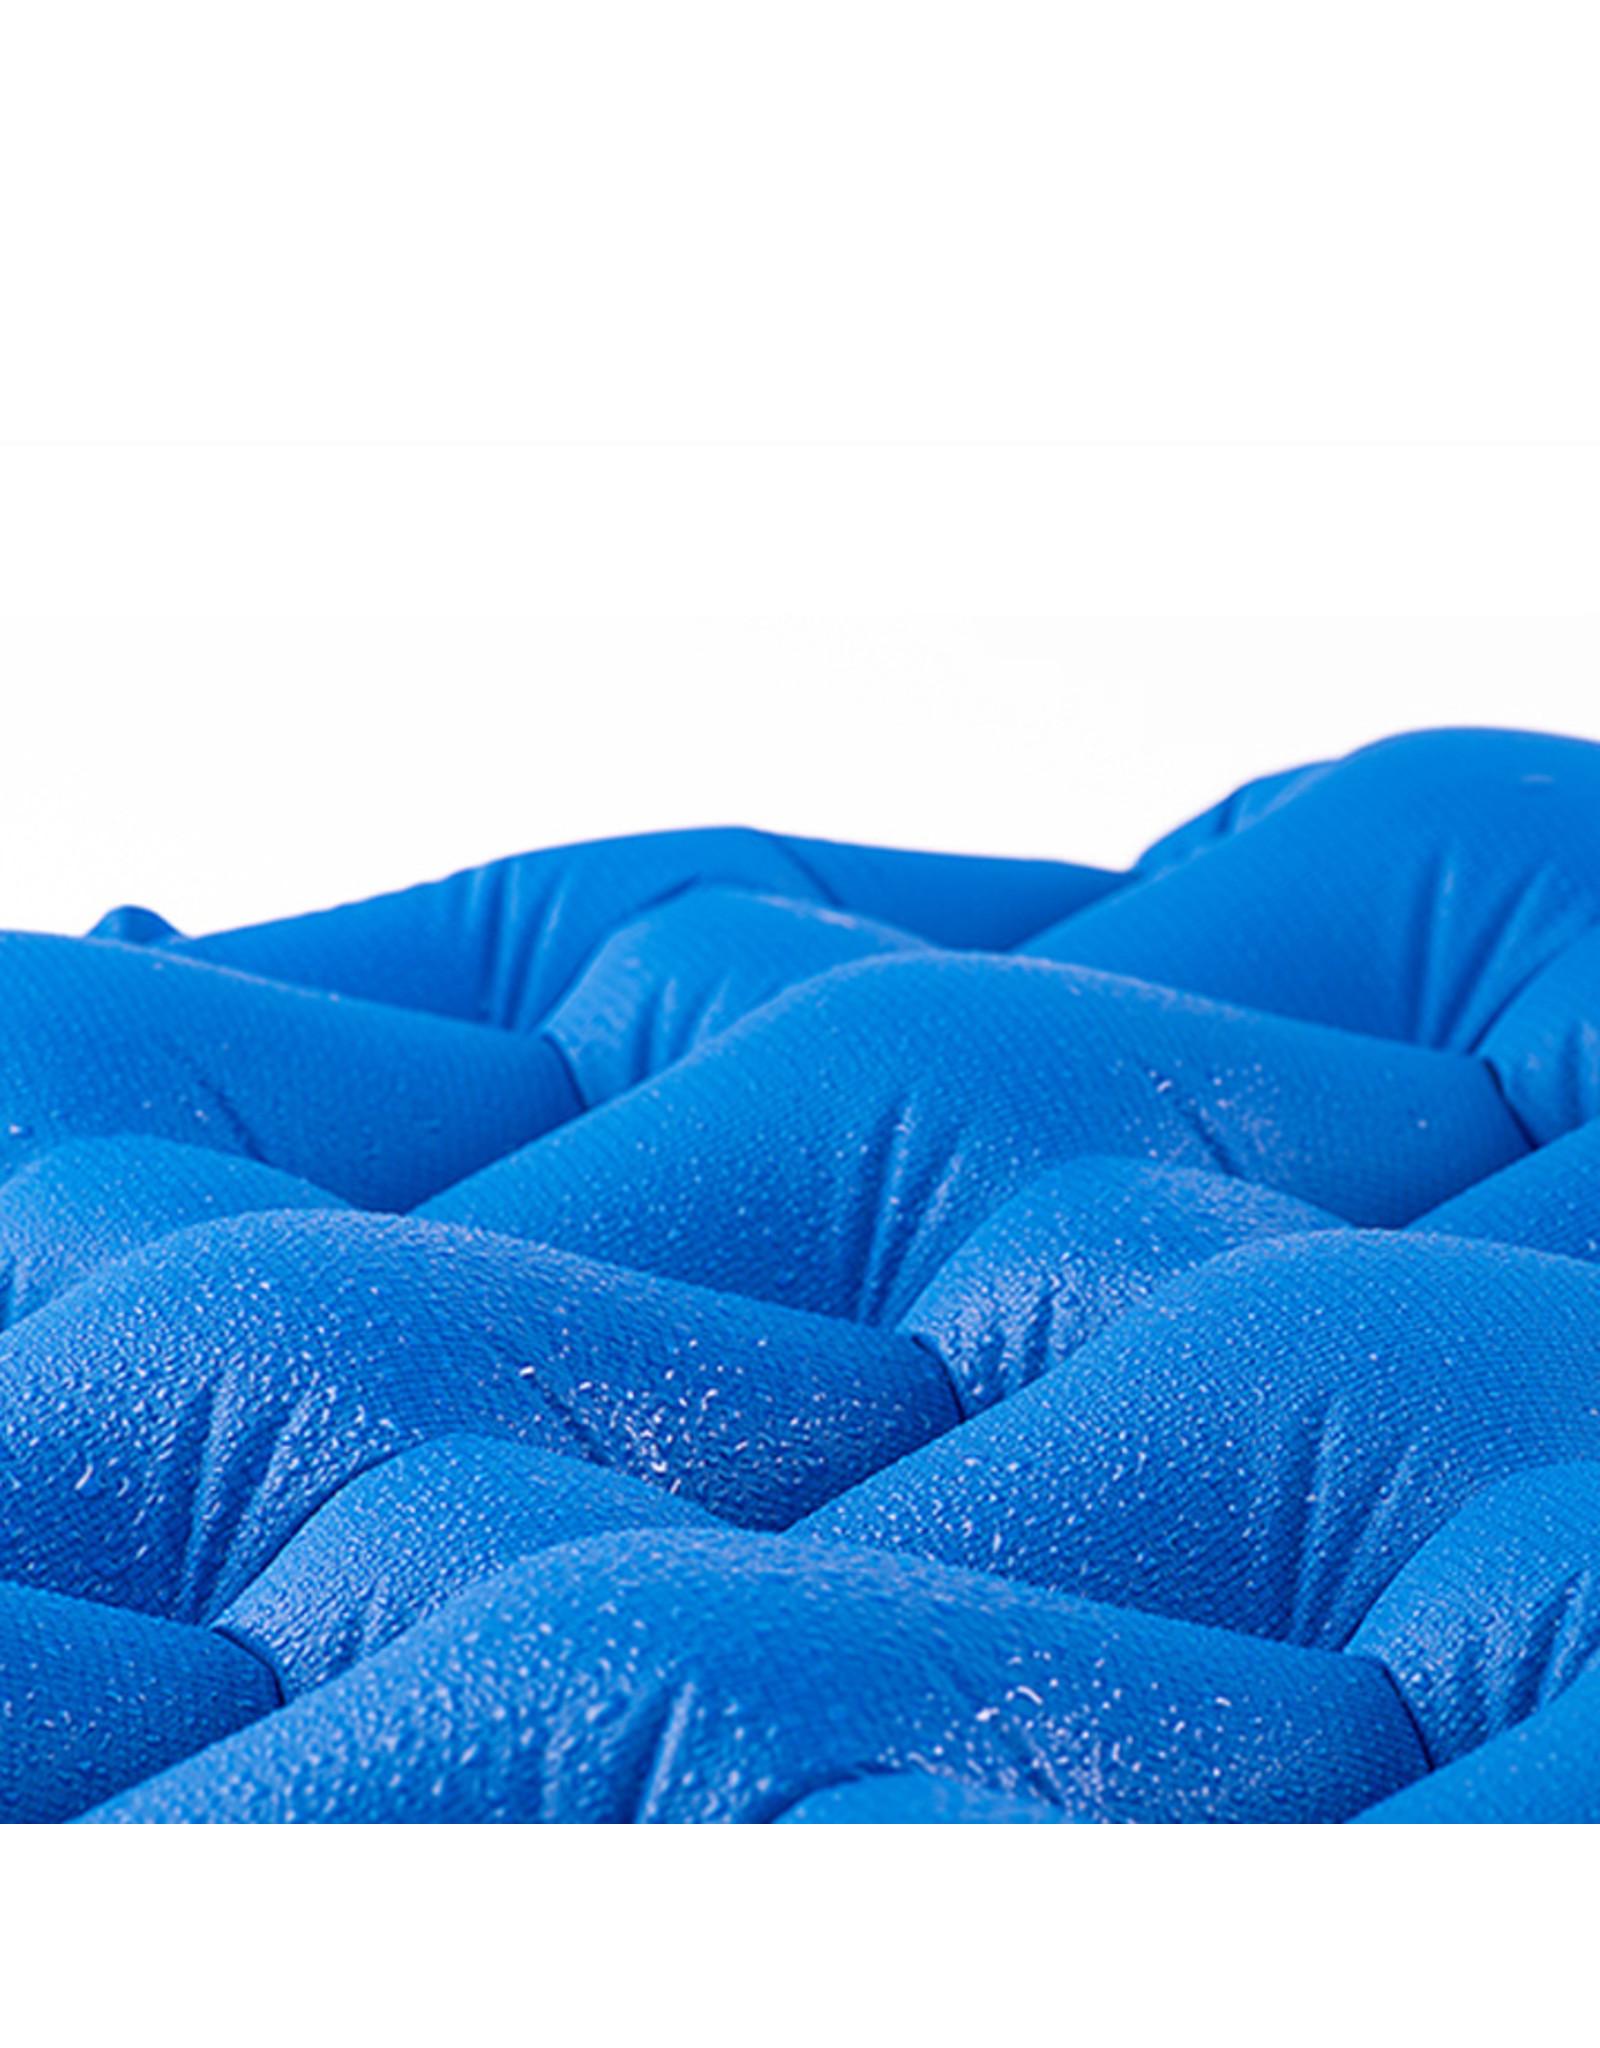 CIRCLE IMPORTS NATURE HIKE  INFLATABLE SLEEP PAD BLUE